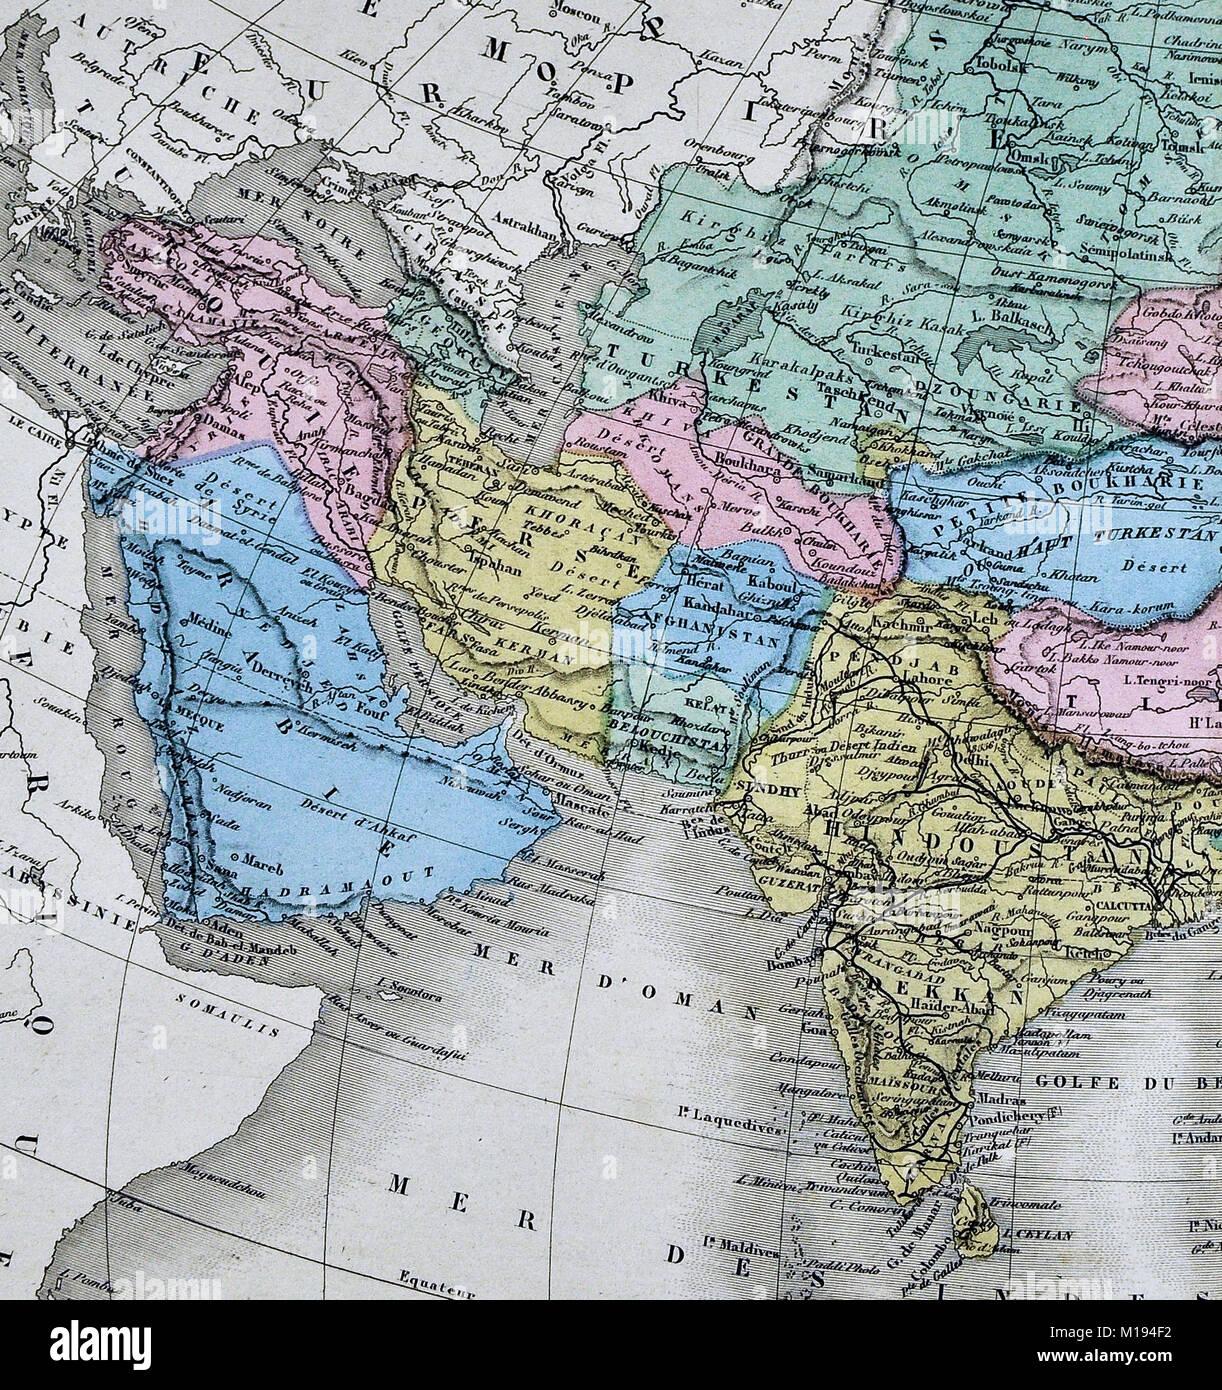 1877 Migeon Map - Western Asia - China Japan India Arabia Mongolia ...